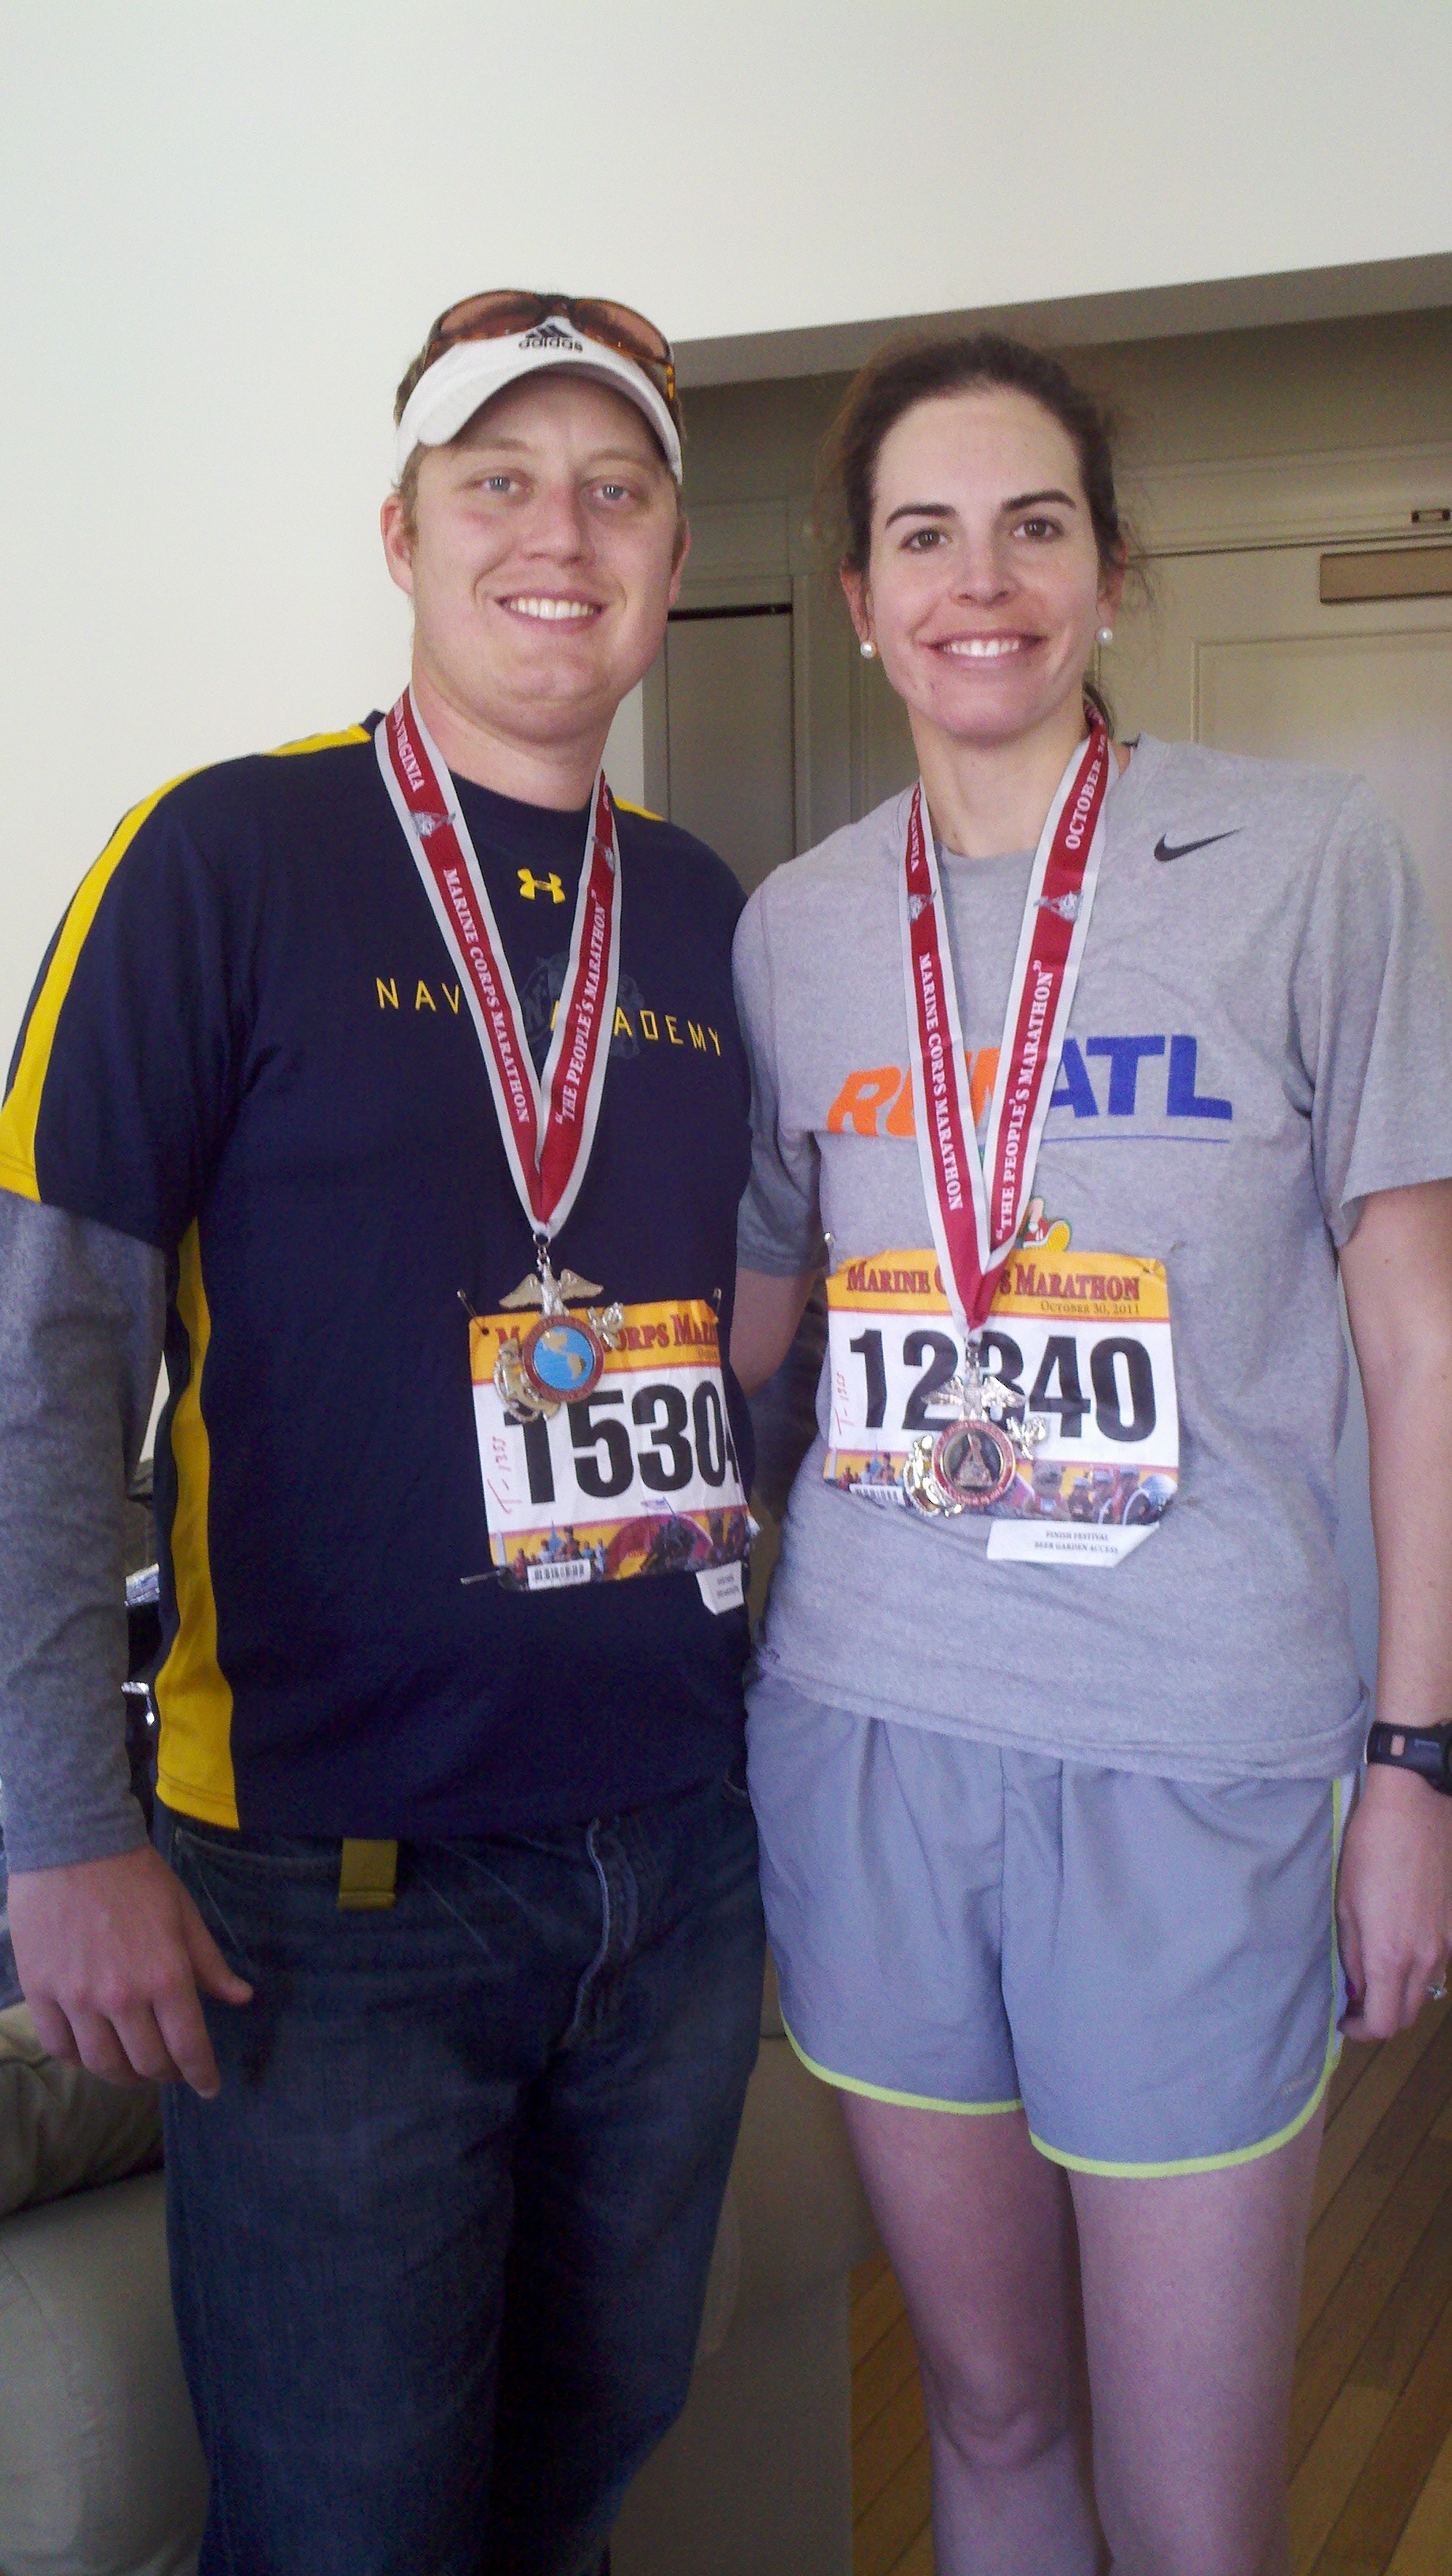 Marathon - Taking it easy